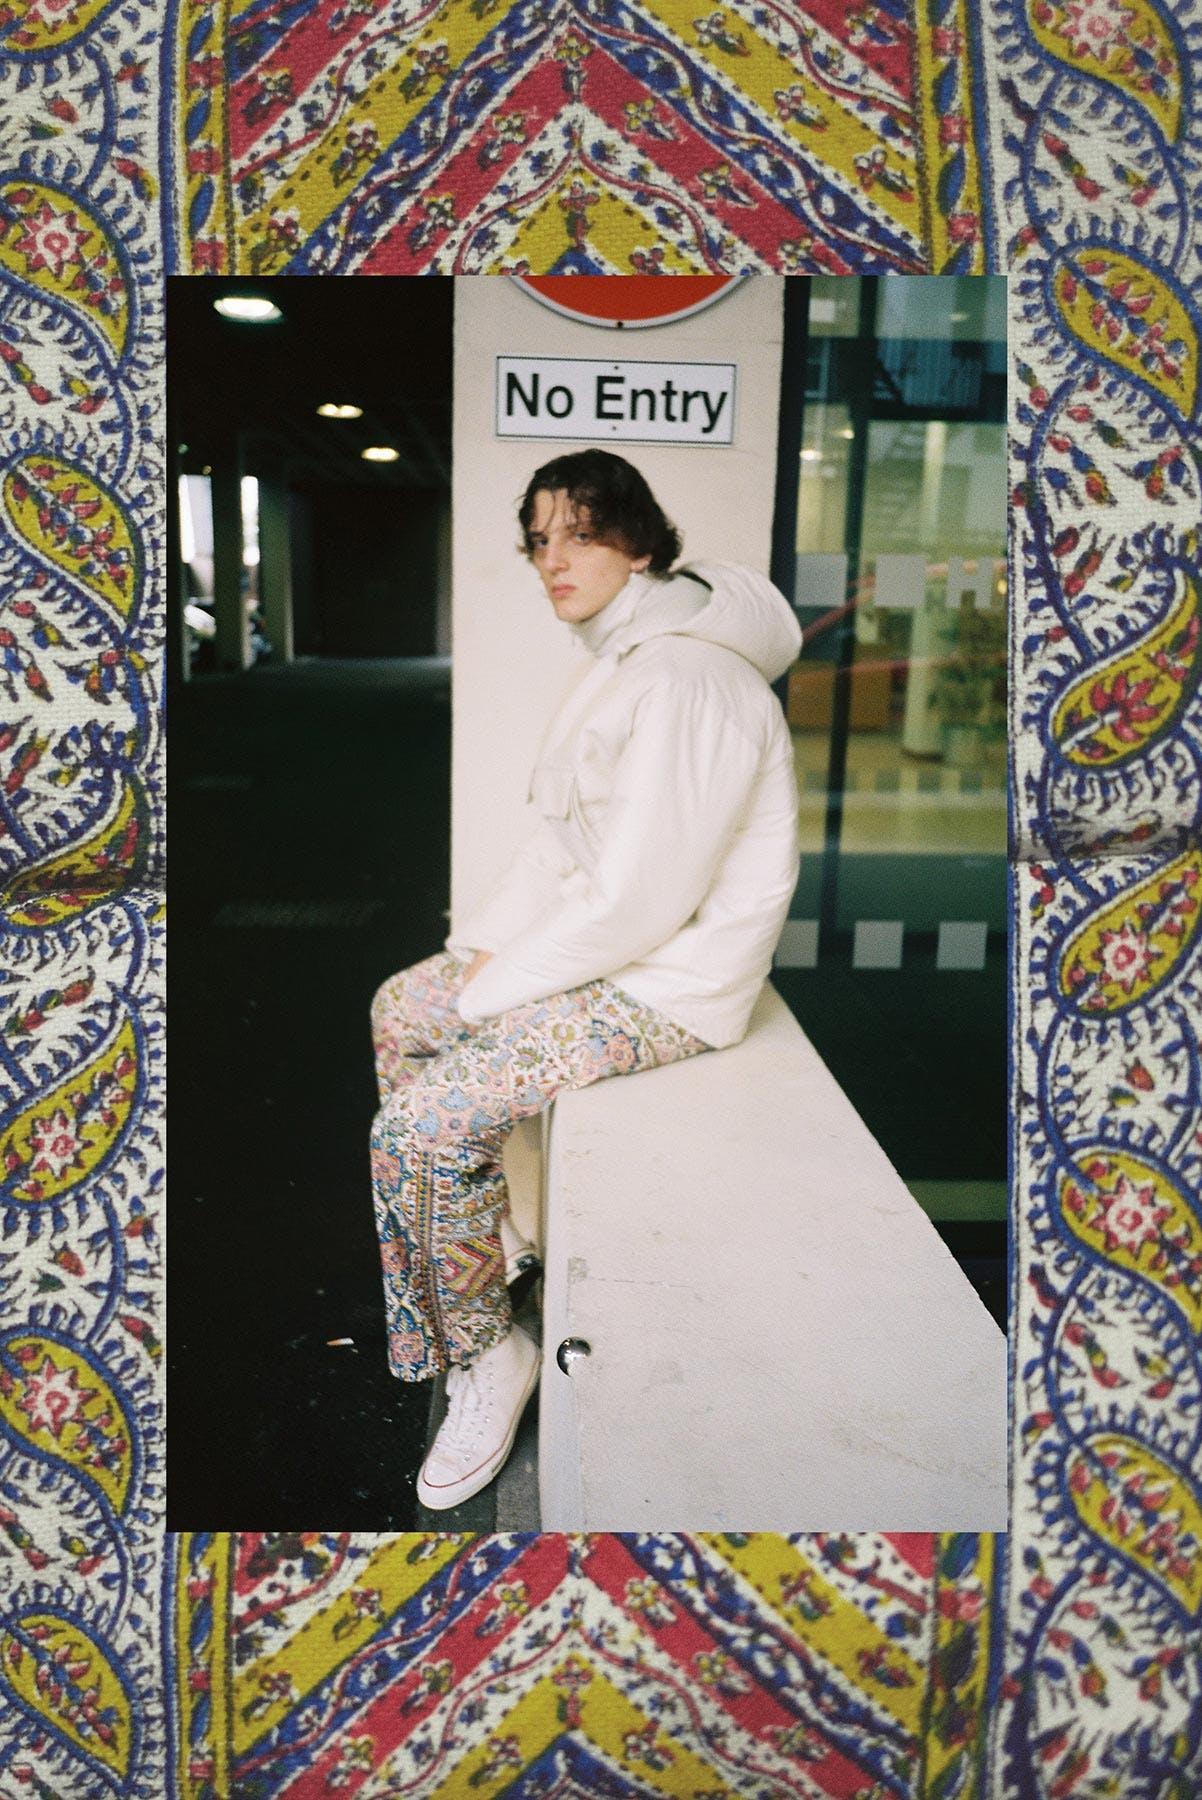 Model wears Paria Farzaneh AW19 at END.